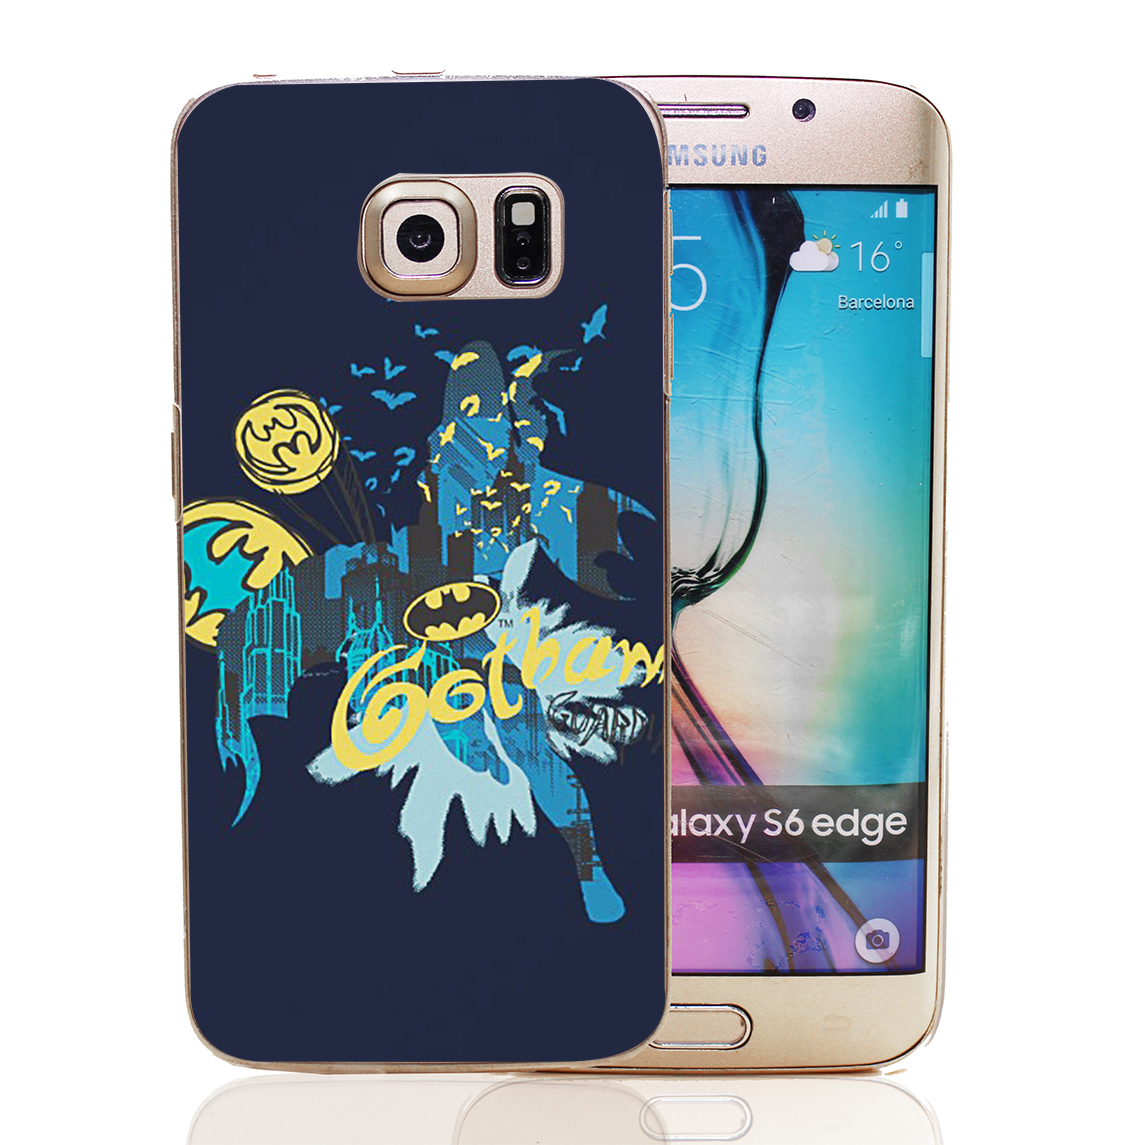 Notebook samsung galaxy s3 - Batman Gotham Guardian Notebook Sketch Style Transparent Hard Back Cover For Samsung Galaxy S3 S4 S4 S5 Mini S6 S7 Edge